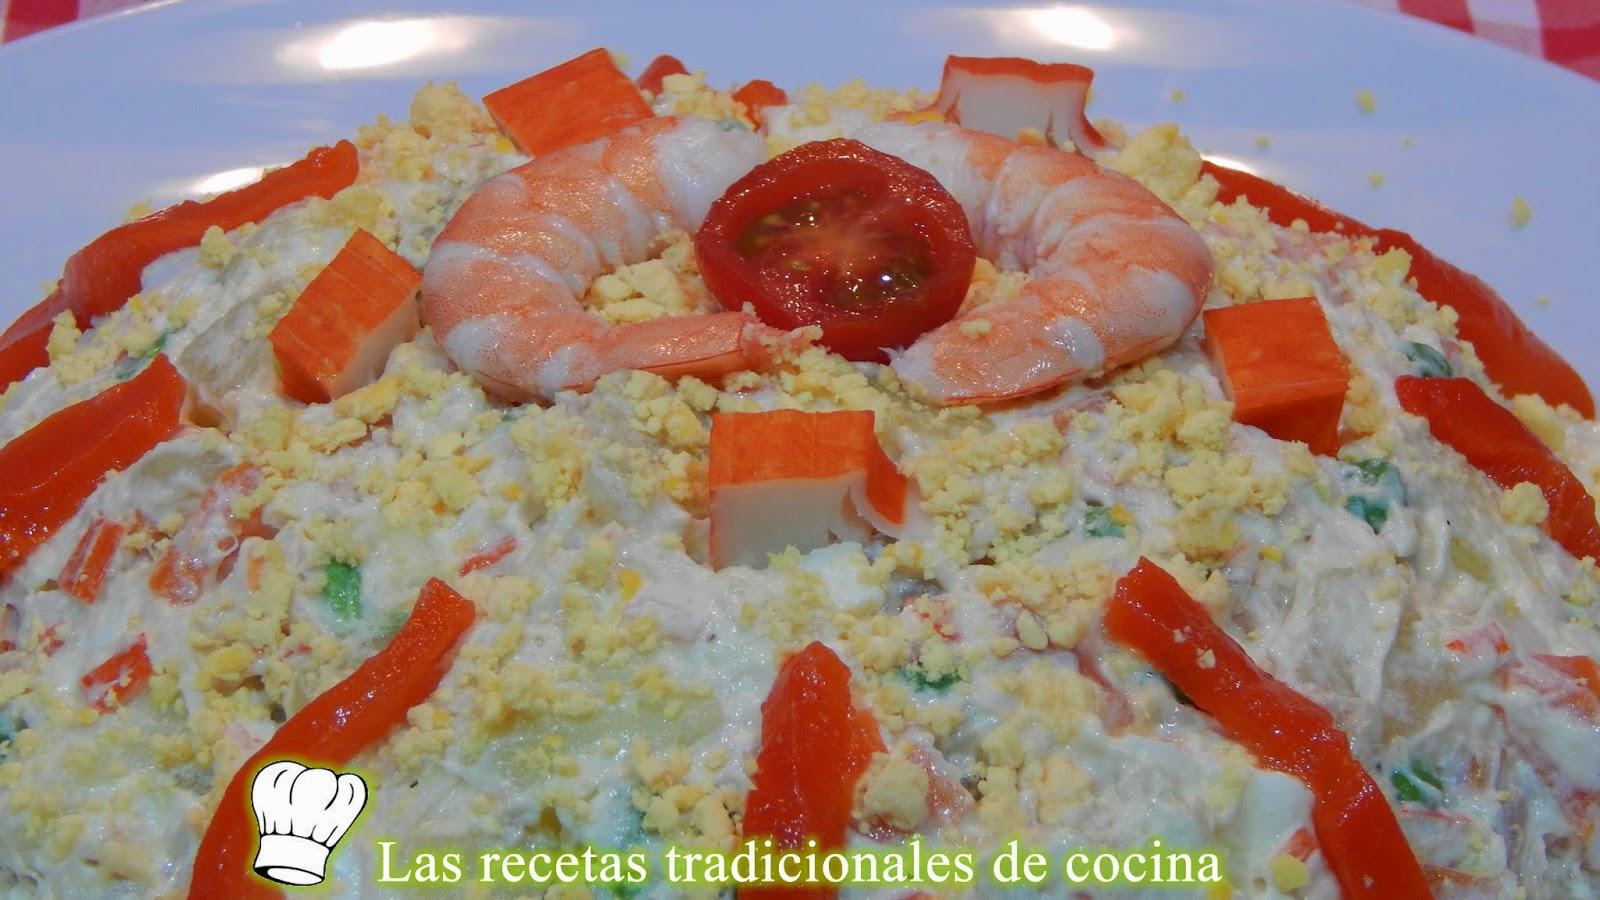 Cocina Rusa Recetas | Receta Facil De Ensaladilla Rusa Con Marisco Recetas De Cocina